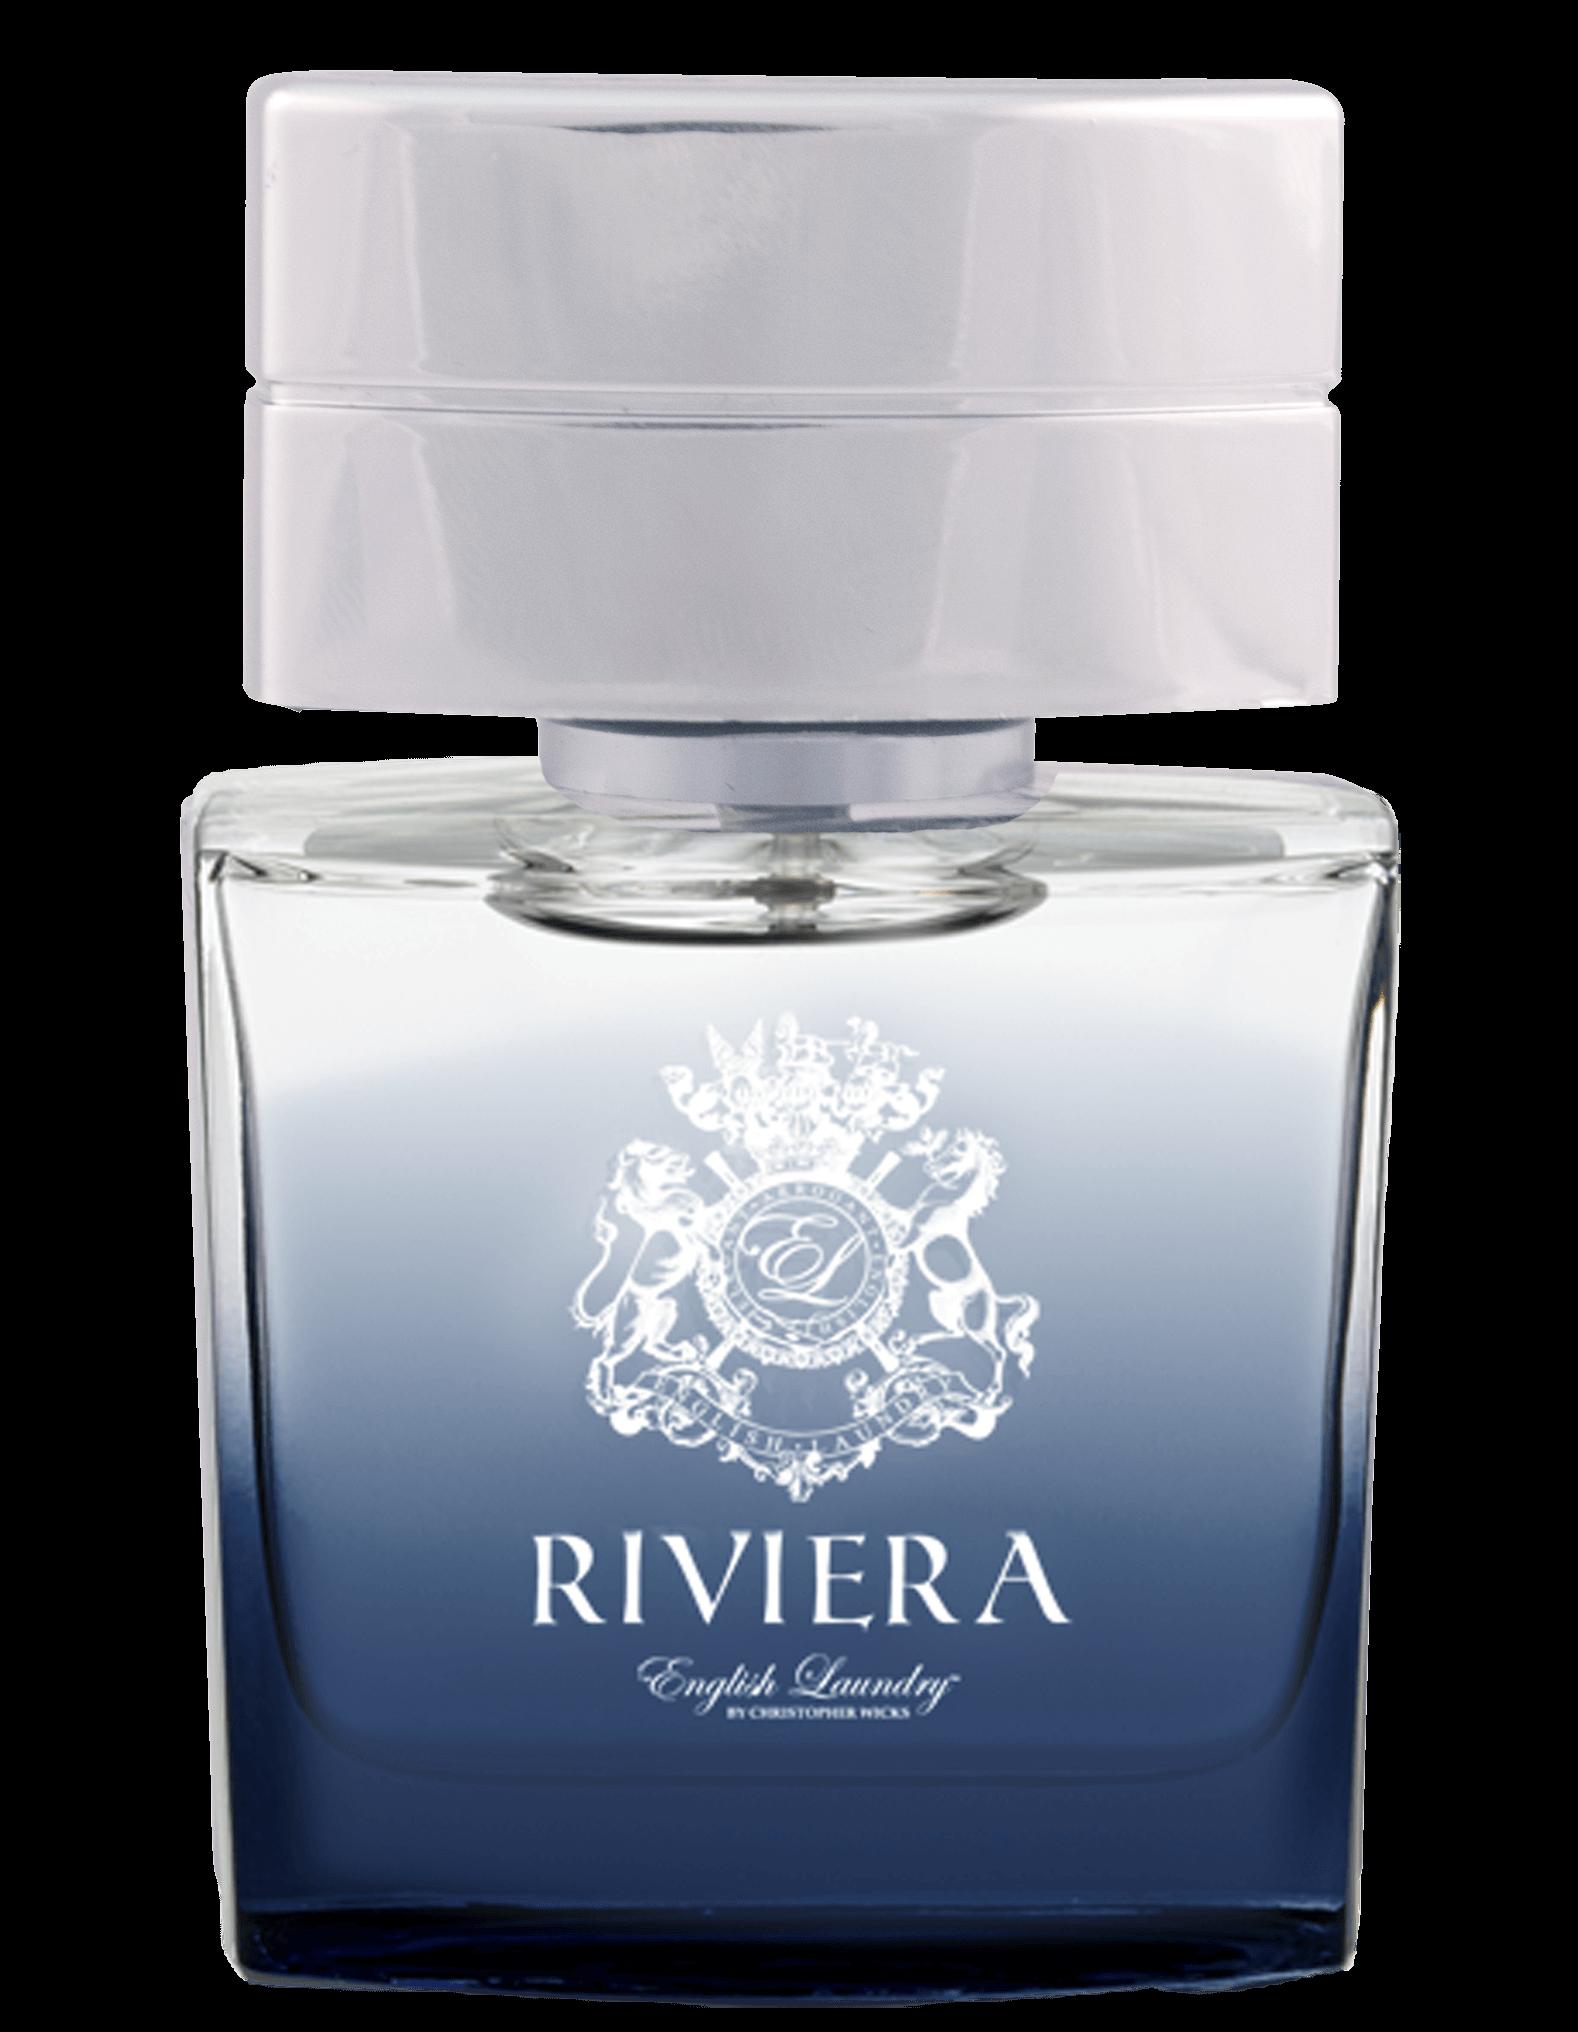 Buy Riviera 20ml Travel Spray English Laundry Fragrance